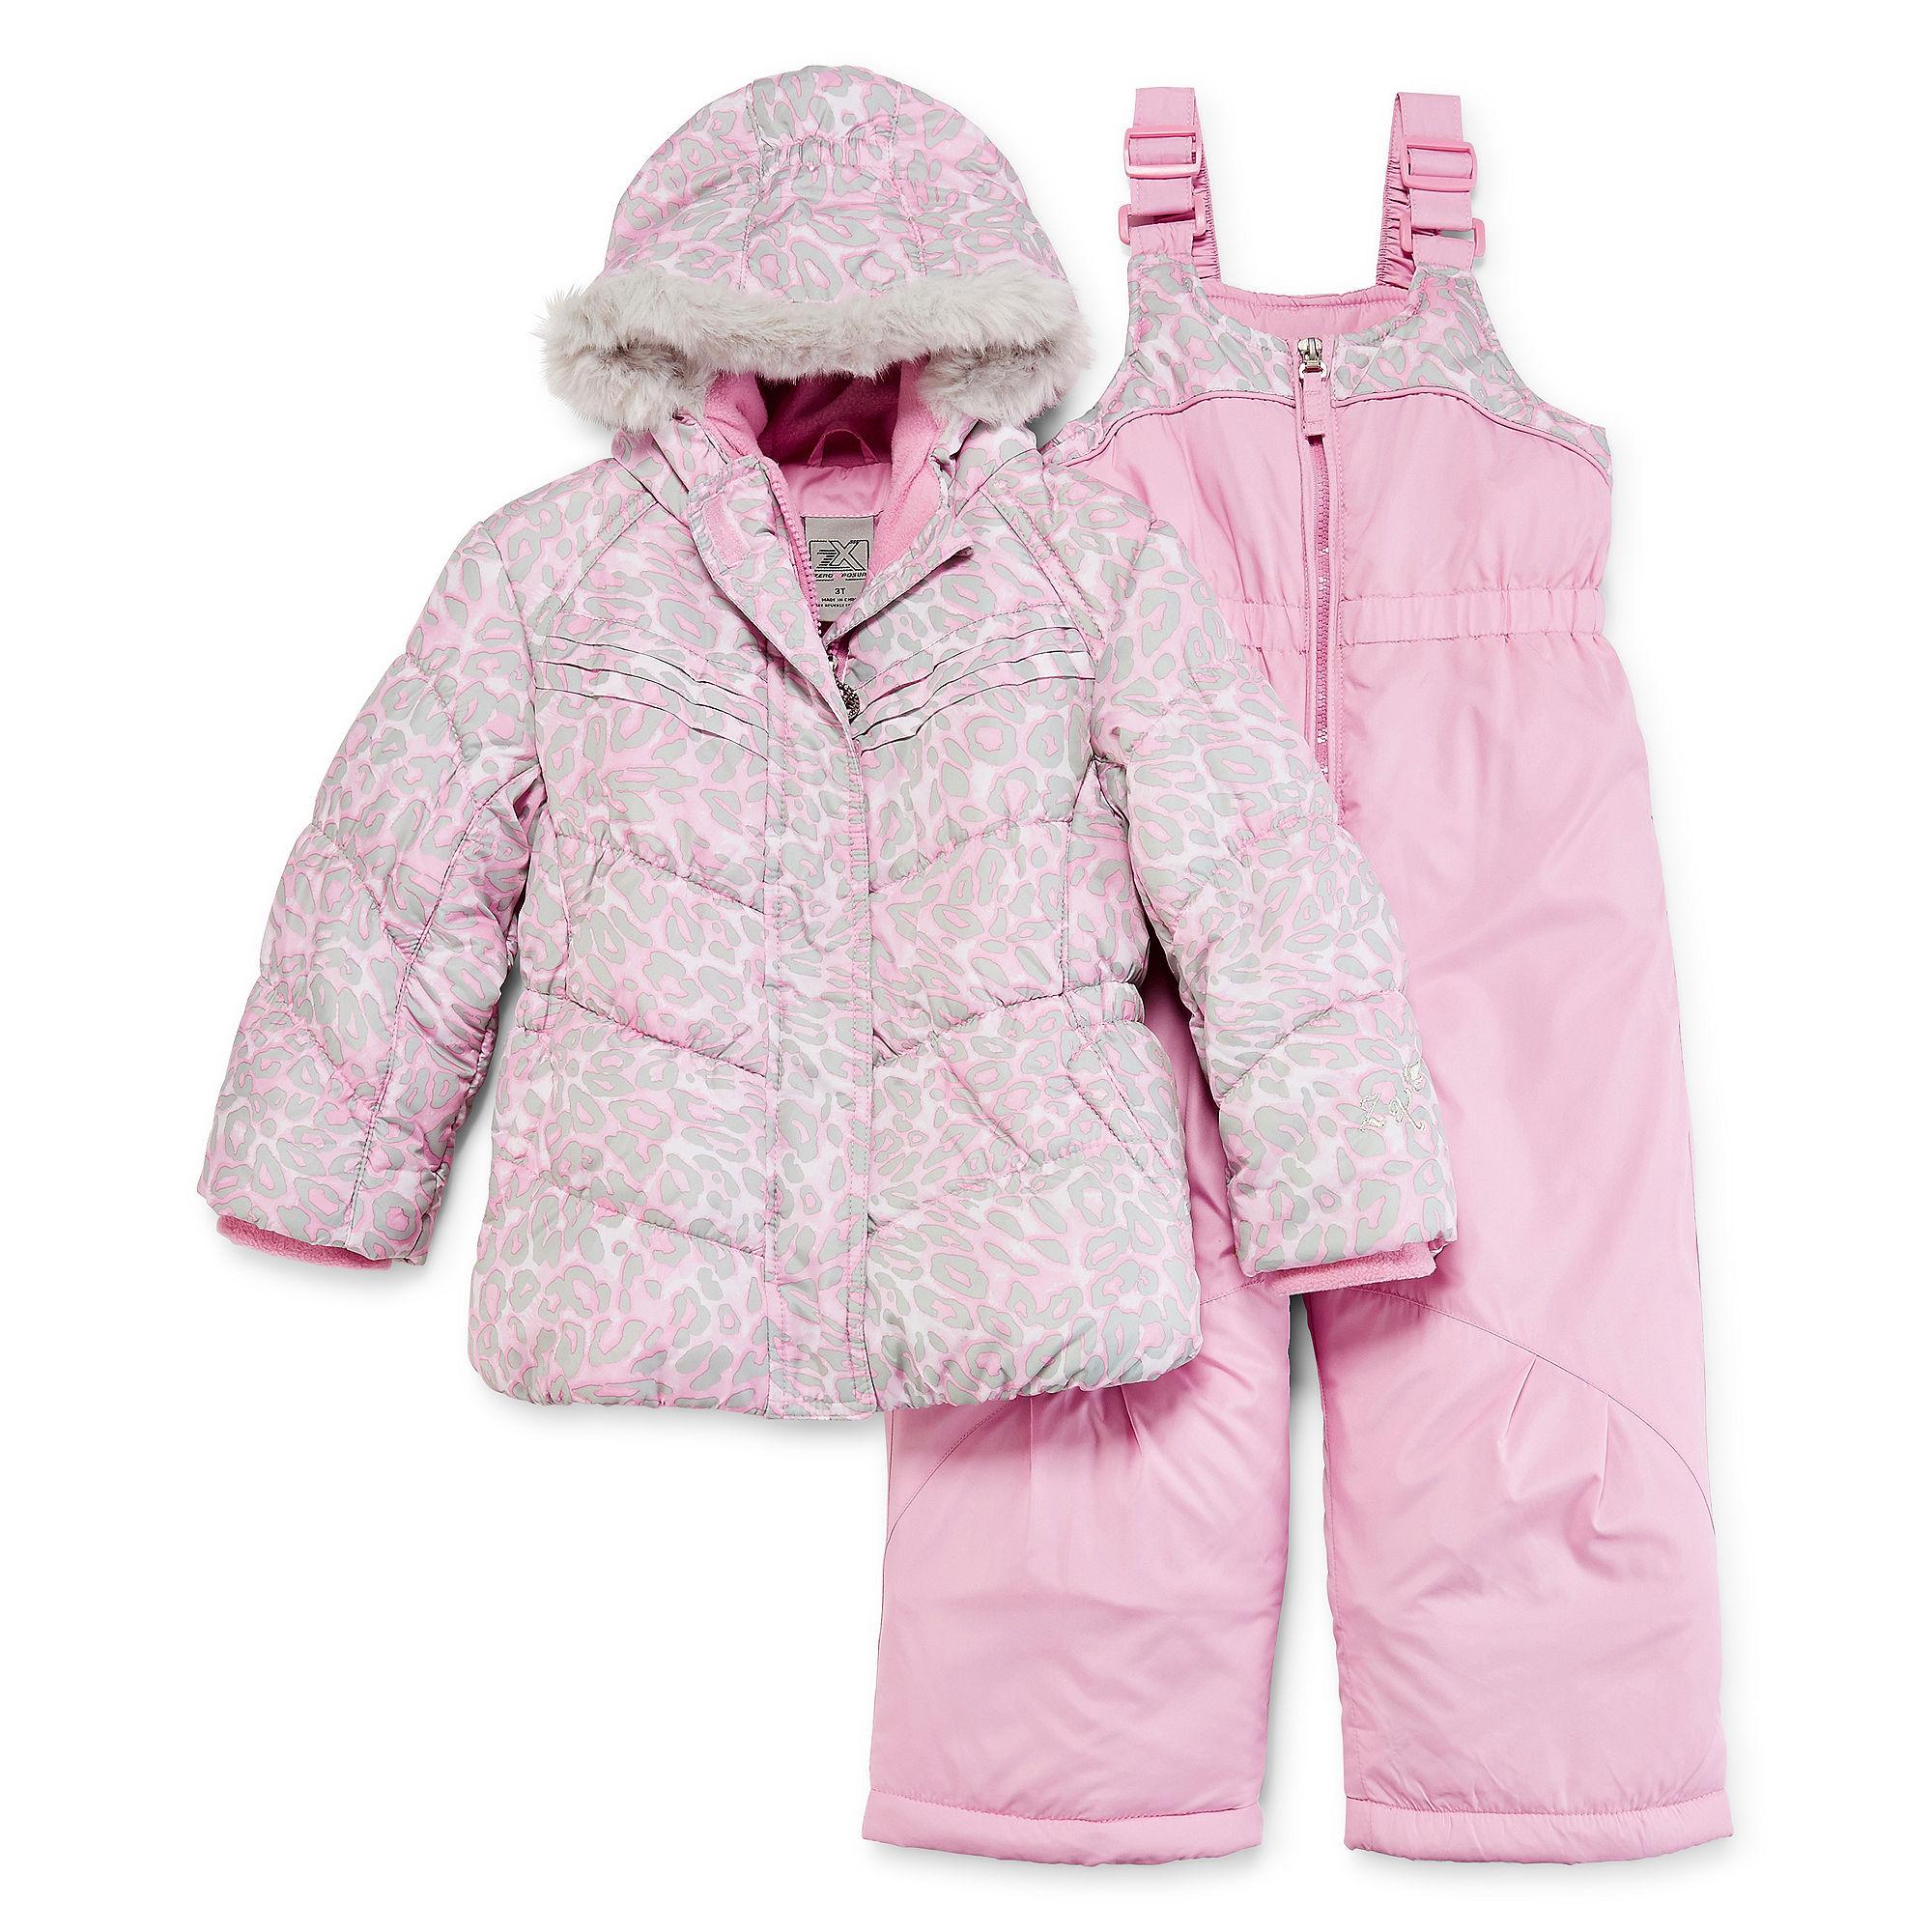 18f86118fd5a UPC 887219514722 - ZeroXposur Jacket and Snow Bib - Toddler Girls 2t ...